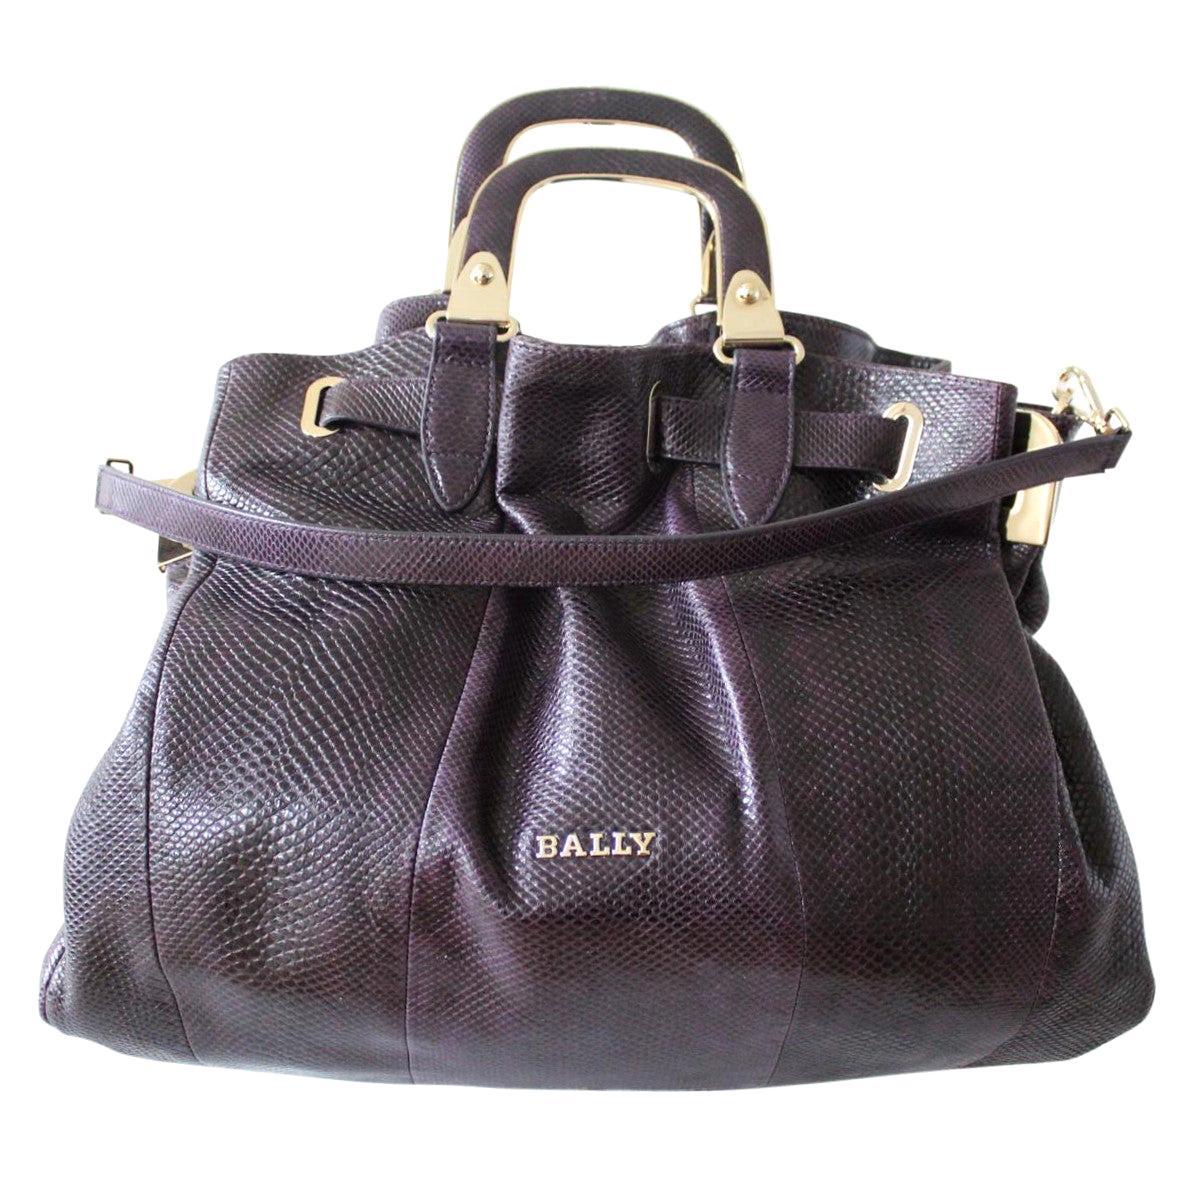 Bally Violet Lizard Bag